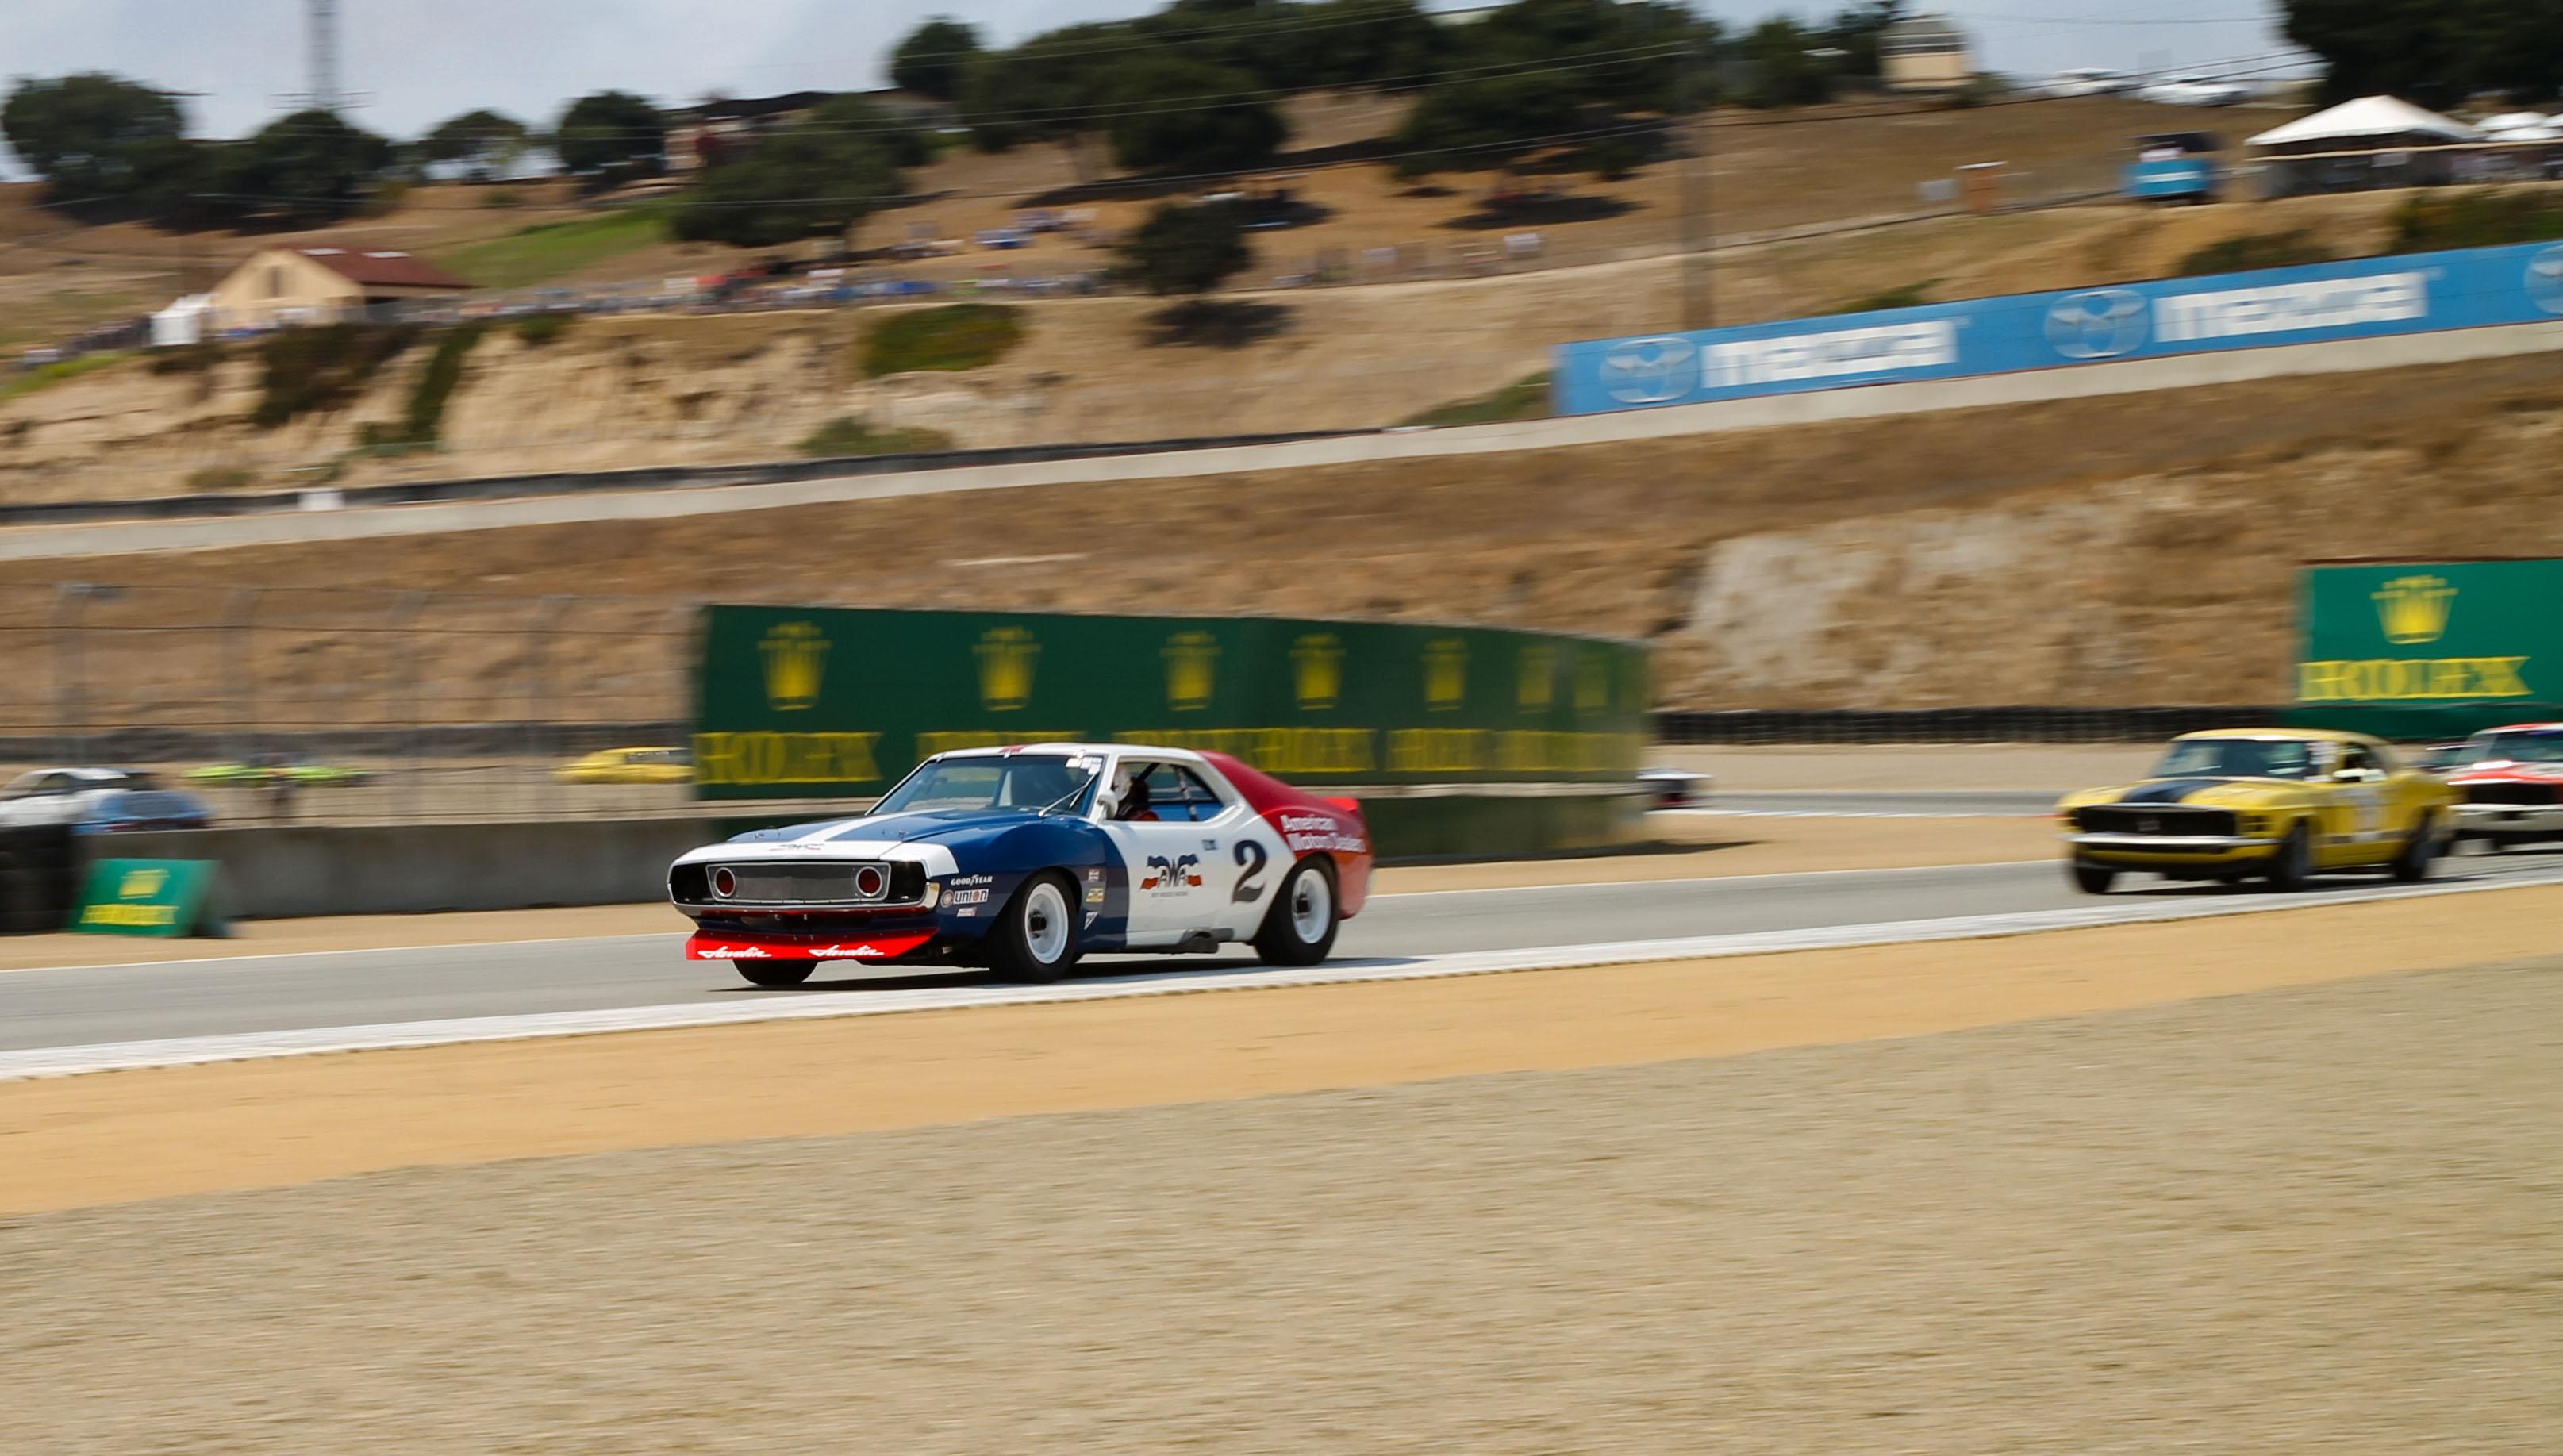 SCRAMP to manage Laguna Seca next 3 years - ClassicCars.com Journal